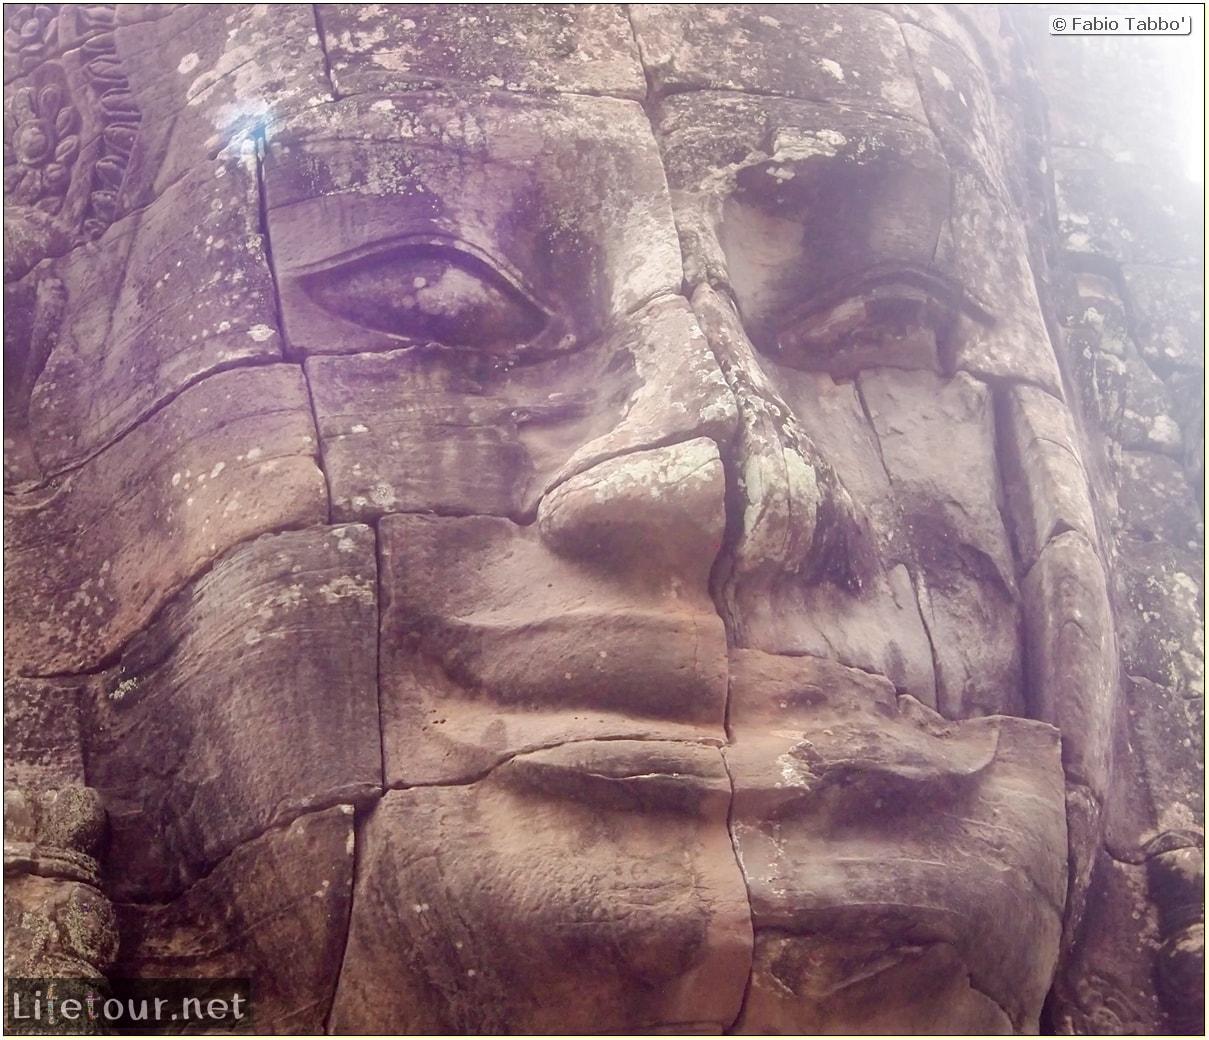 Fabio_s-LifeTour---Cambodia-(2017-July-August)---Siem-Reap-(Angkor)---Angkor-temples---Bayon-temple---20272